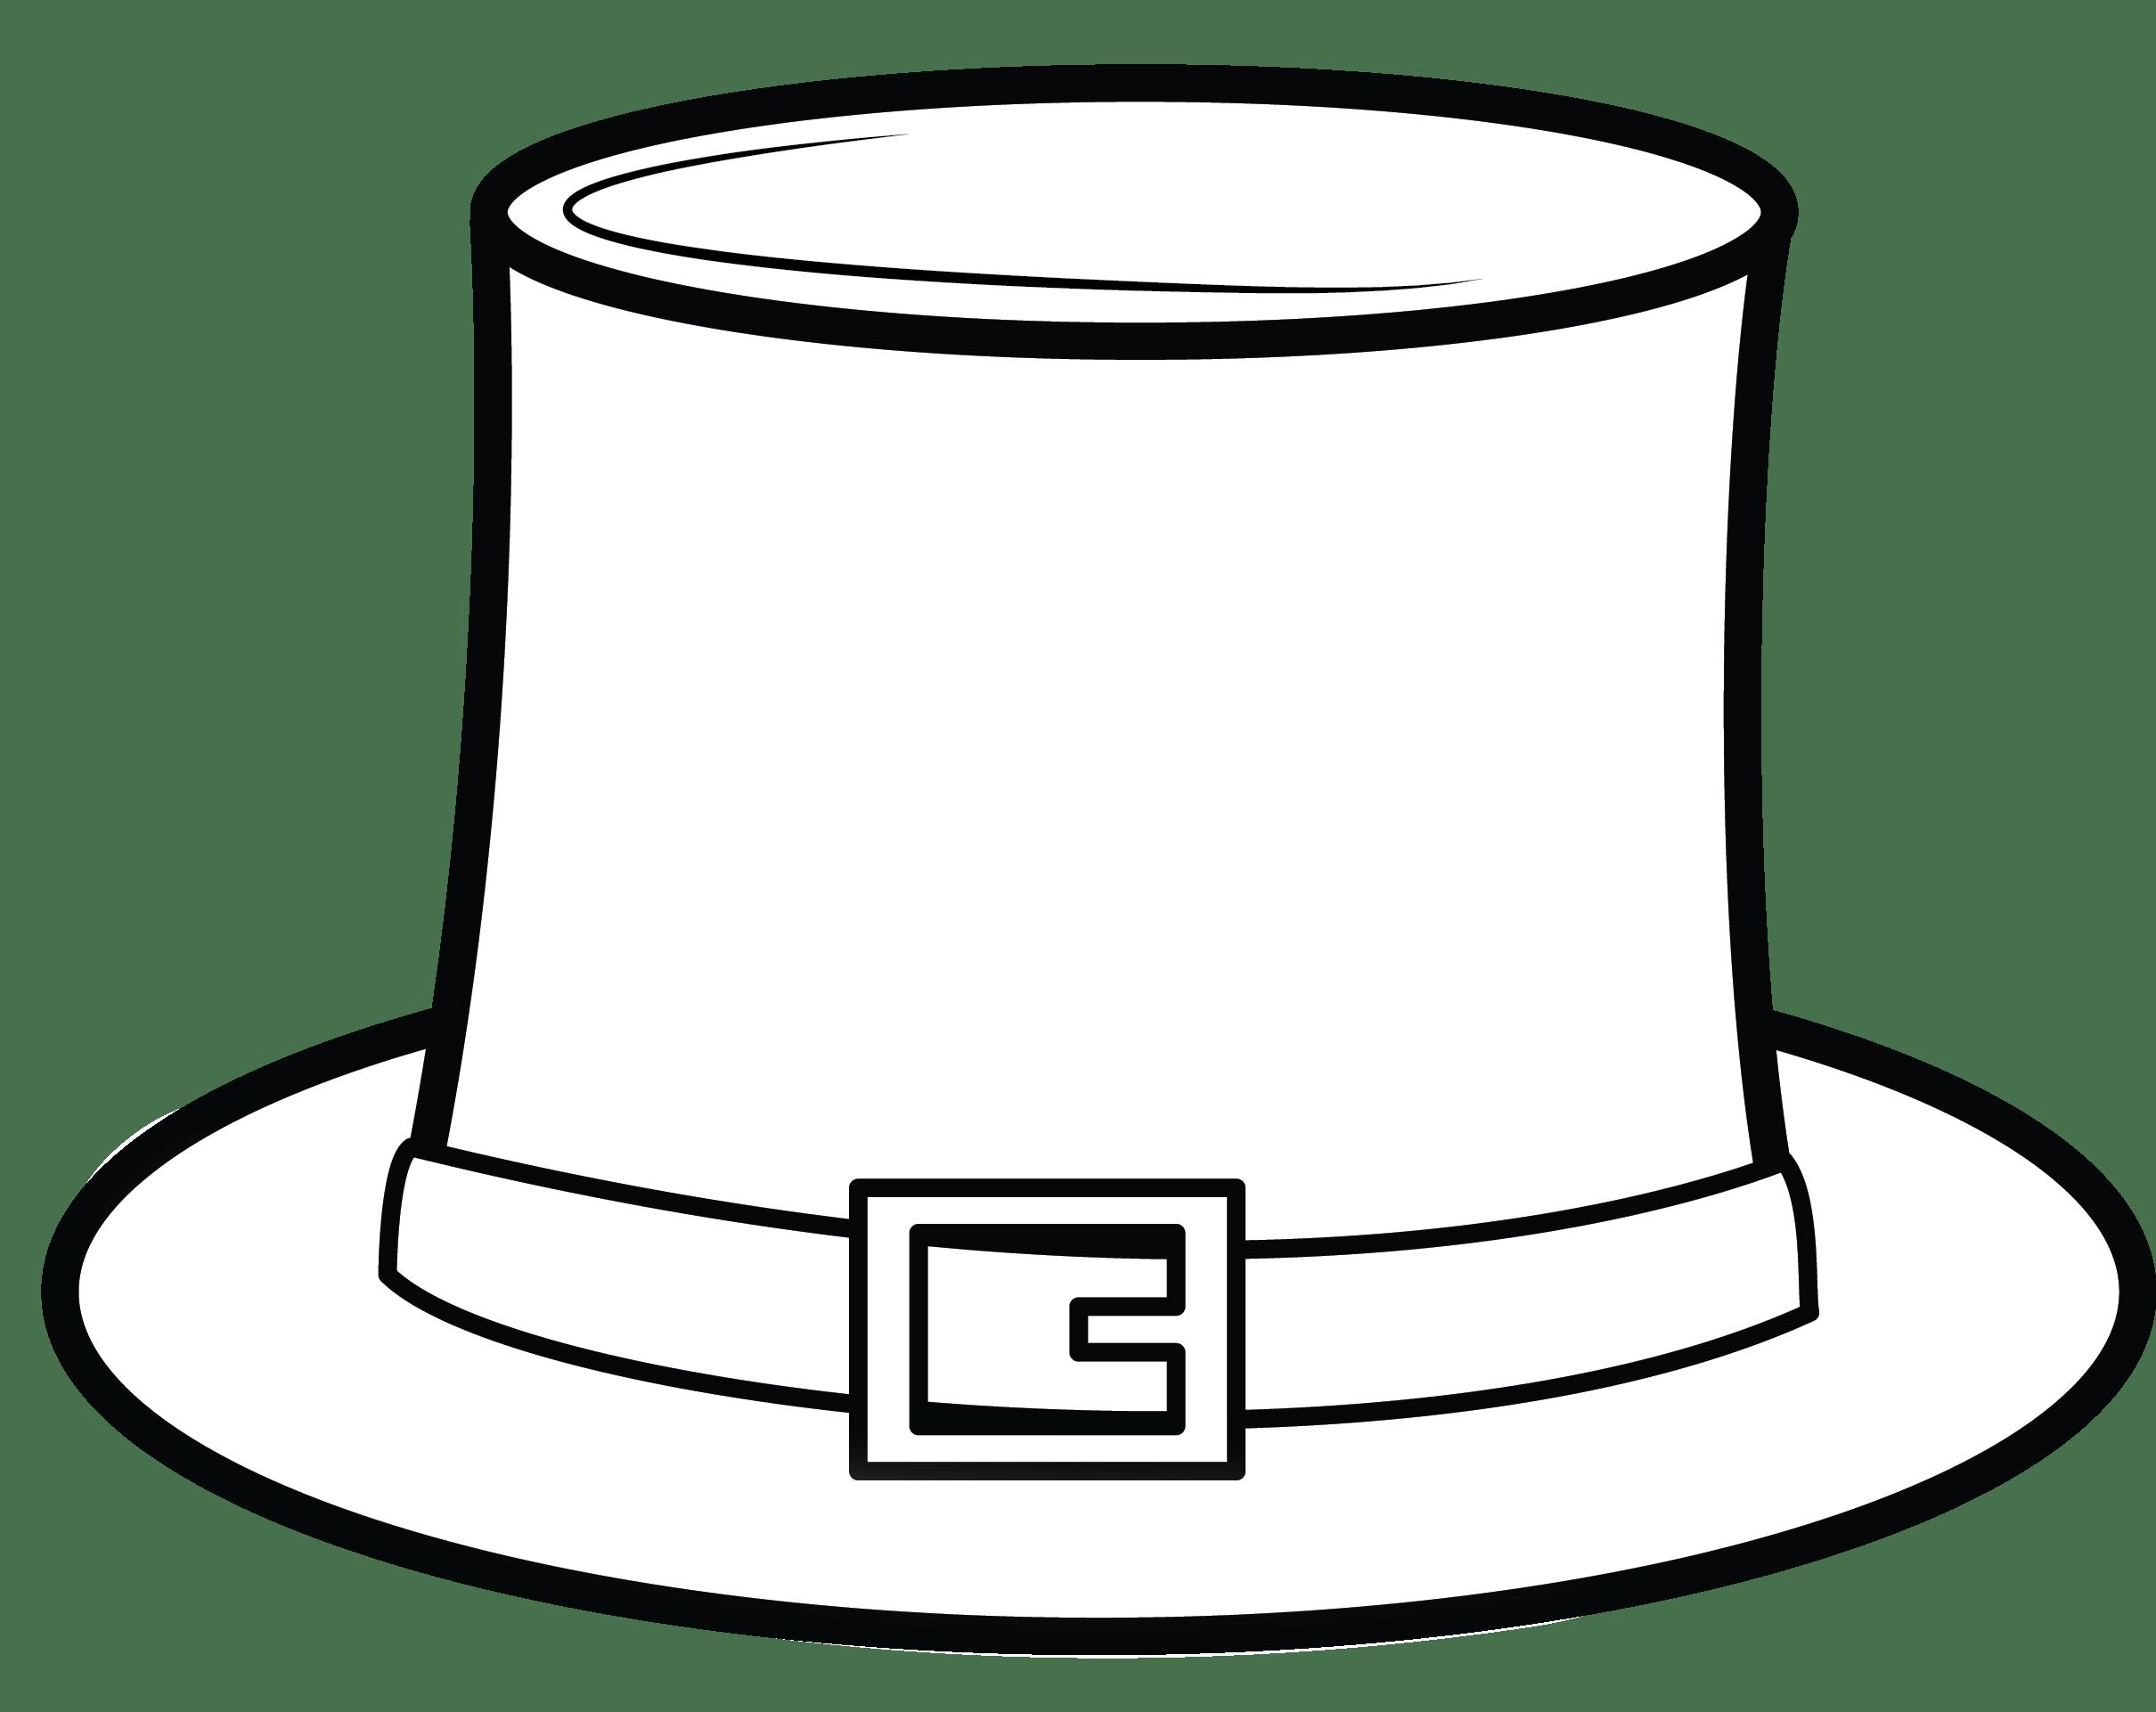 St. Patrick Clip Art Free > Nastaran's Resources